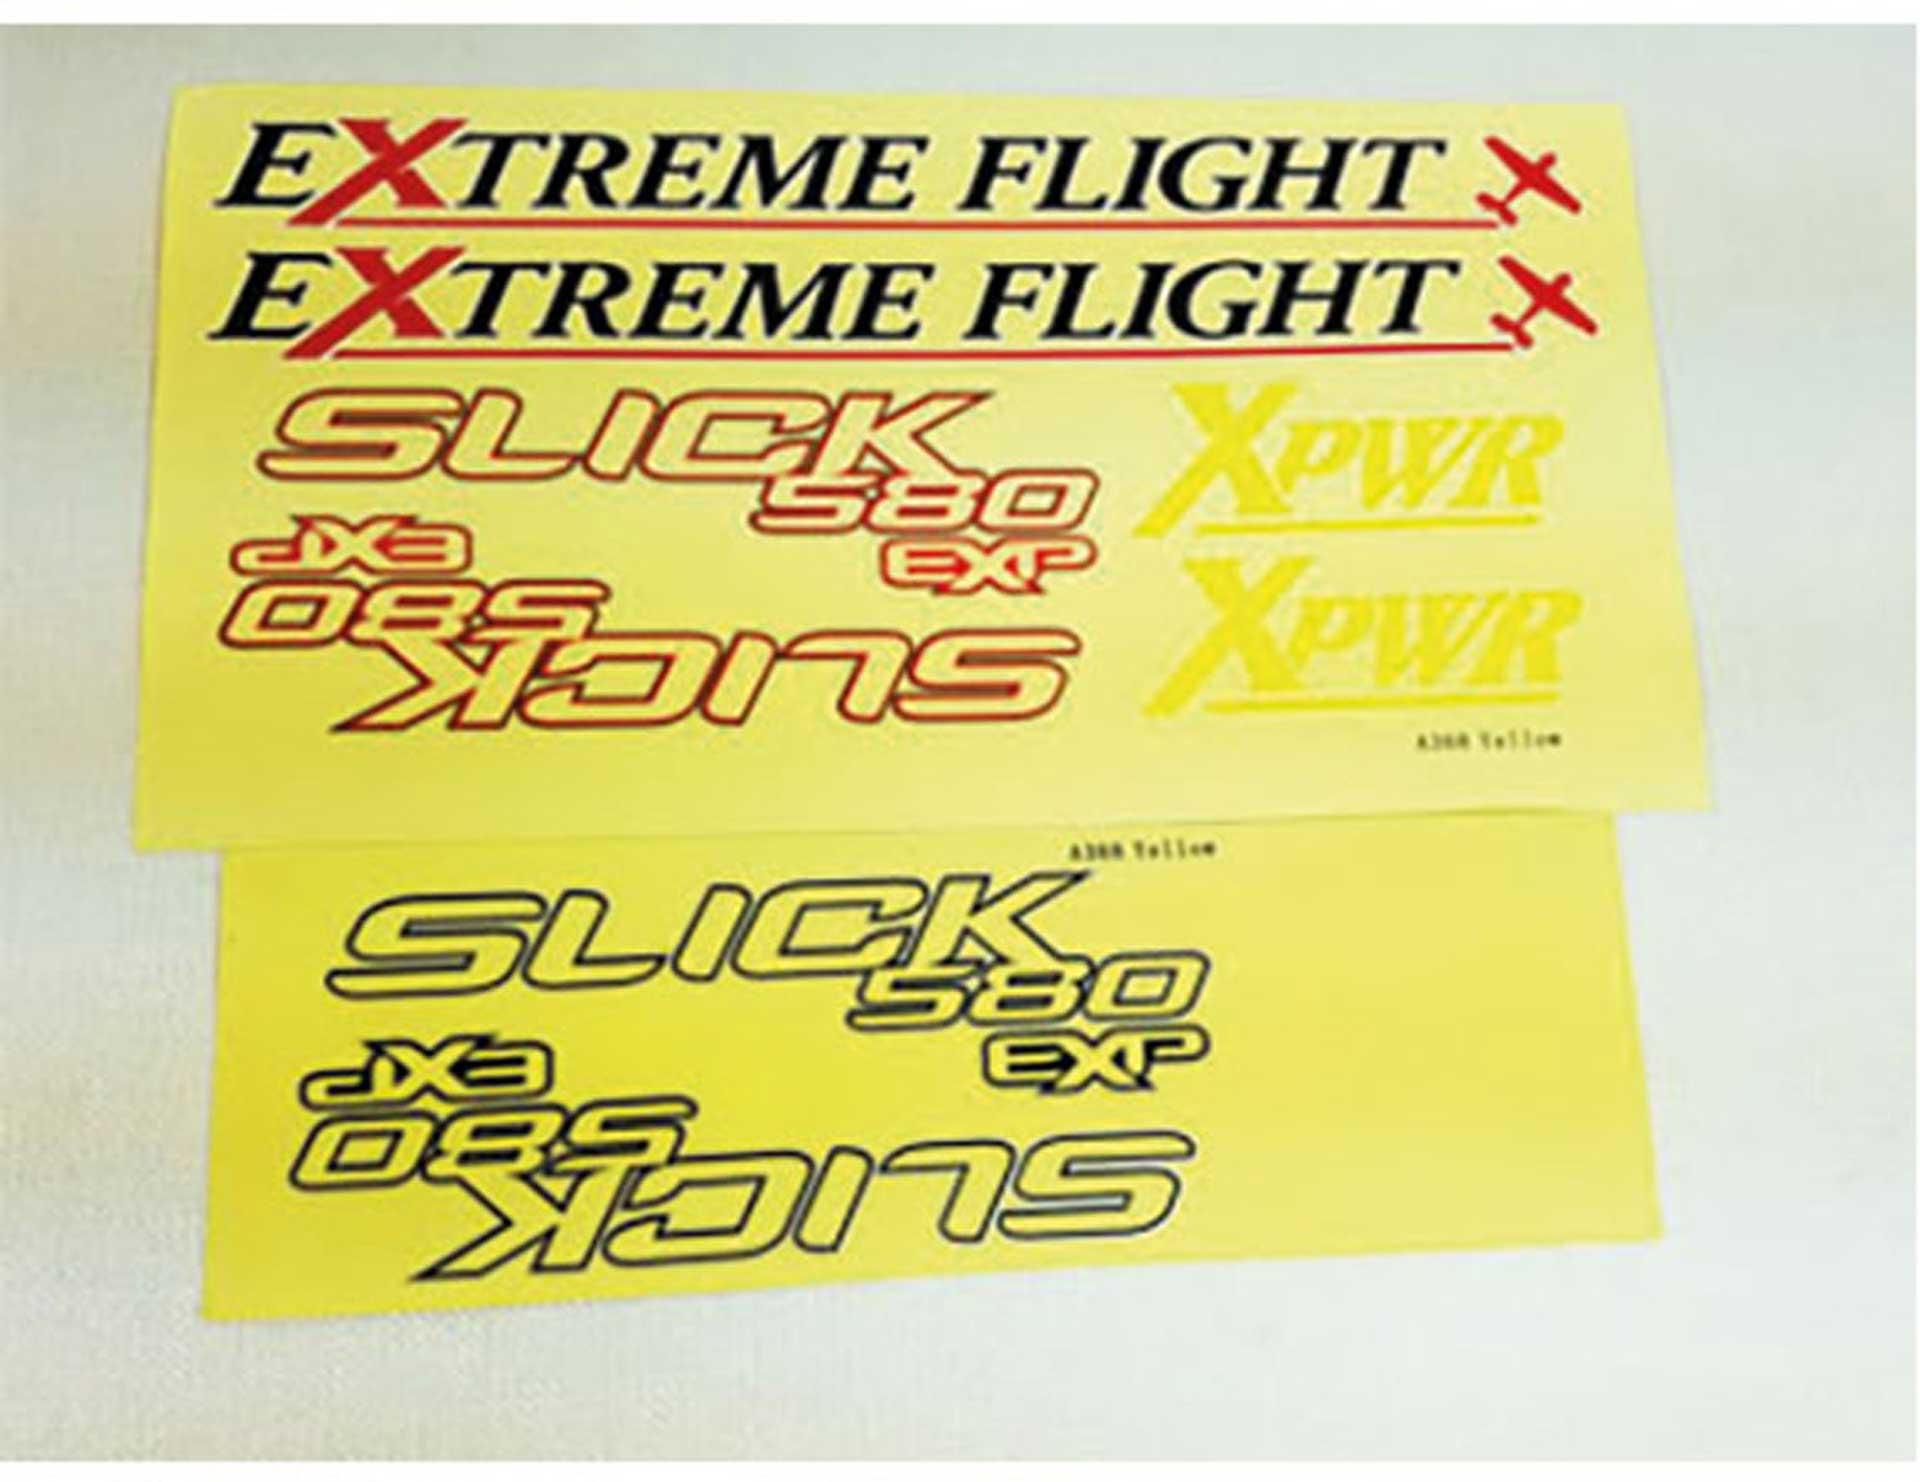 "EXTREMEFLIGHT-RC DEKORBOGEN SLICK 580 52"" GELB / BLAU"